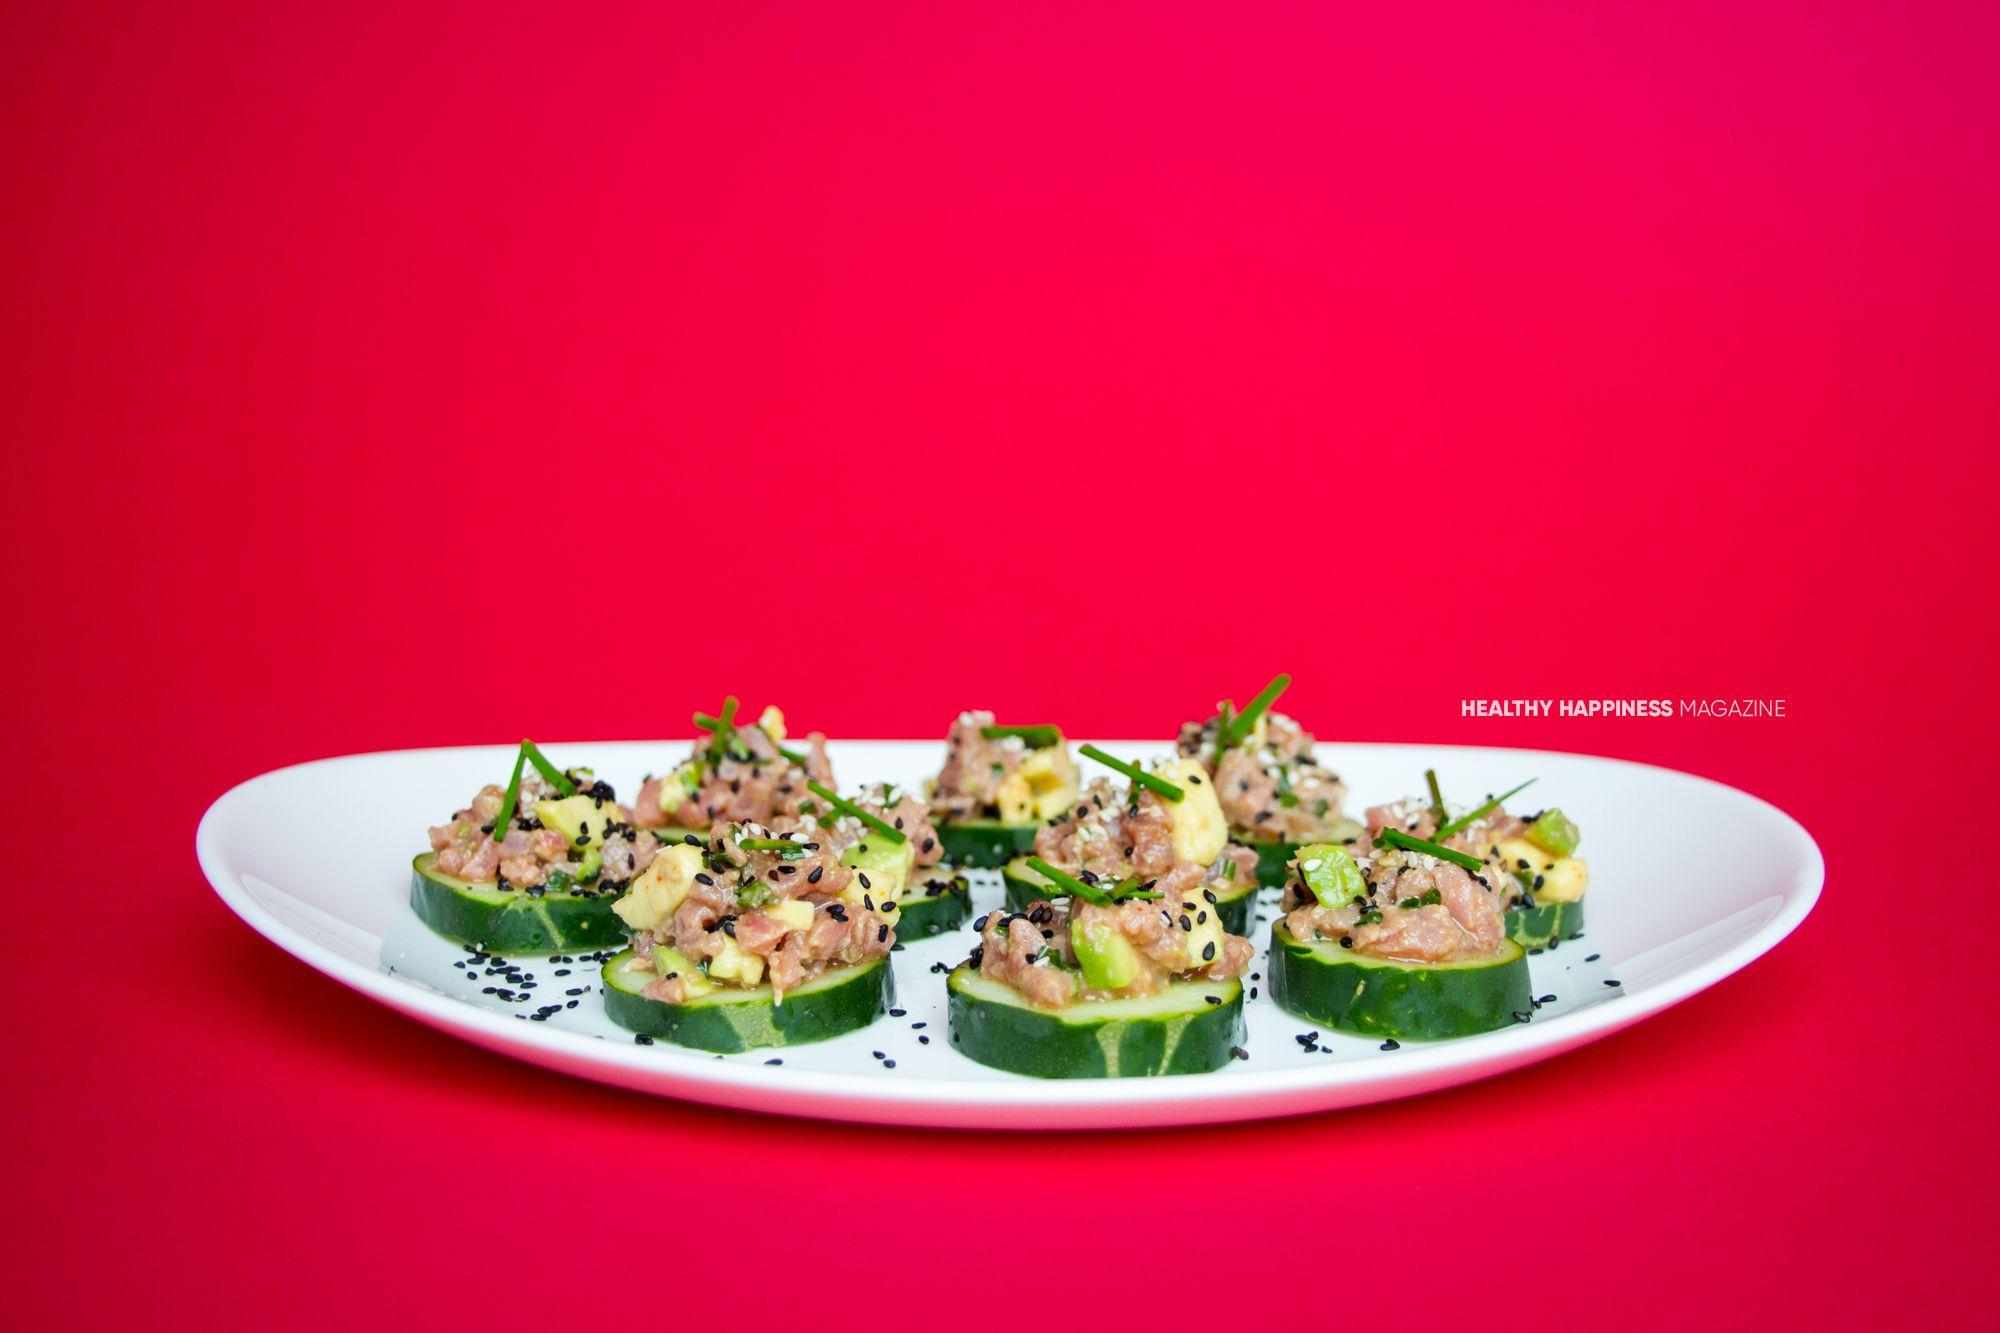 Bocadillos de tartar de atún #healthyhappinessmag. Receta completa: http://healthyhappiness.fit/bocadillos-de-tartar-de-atun/